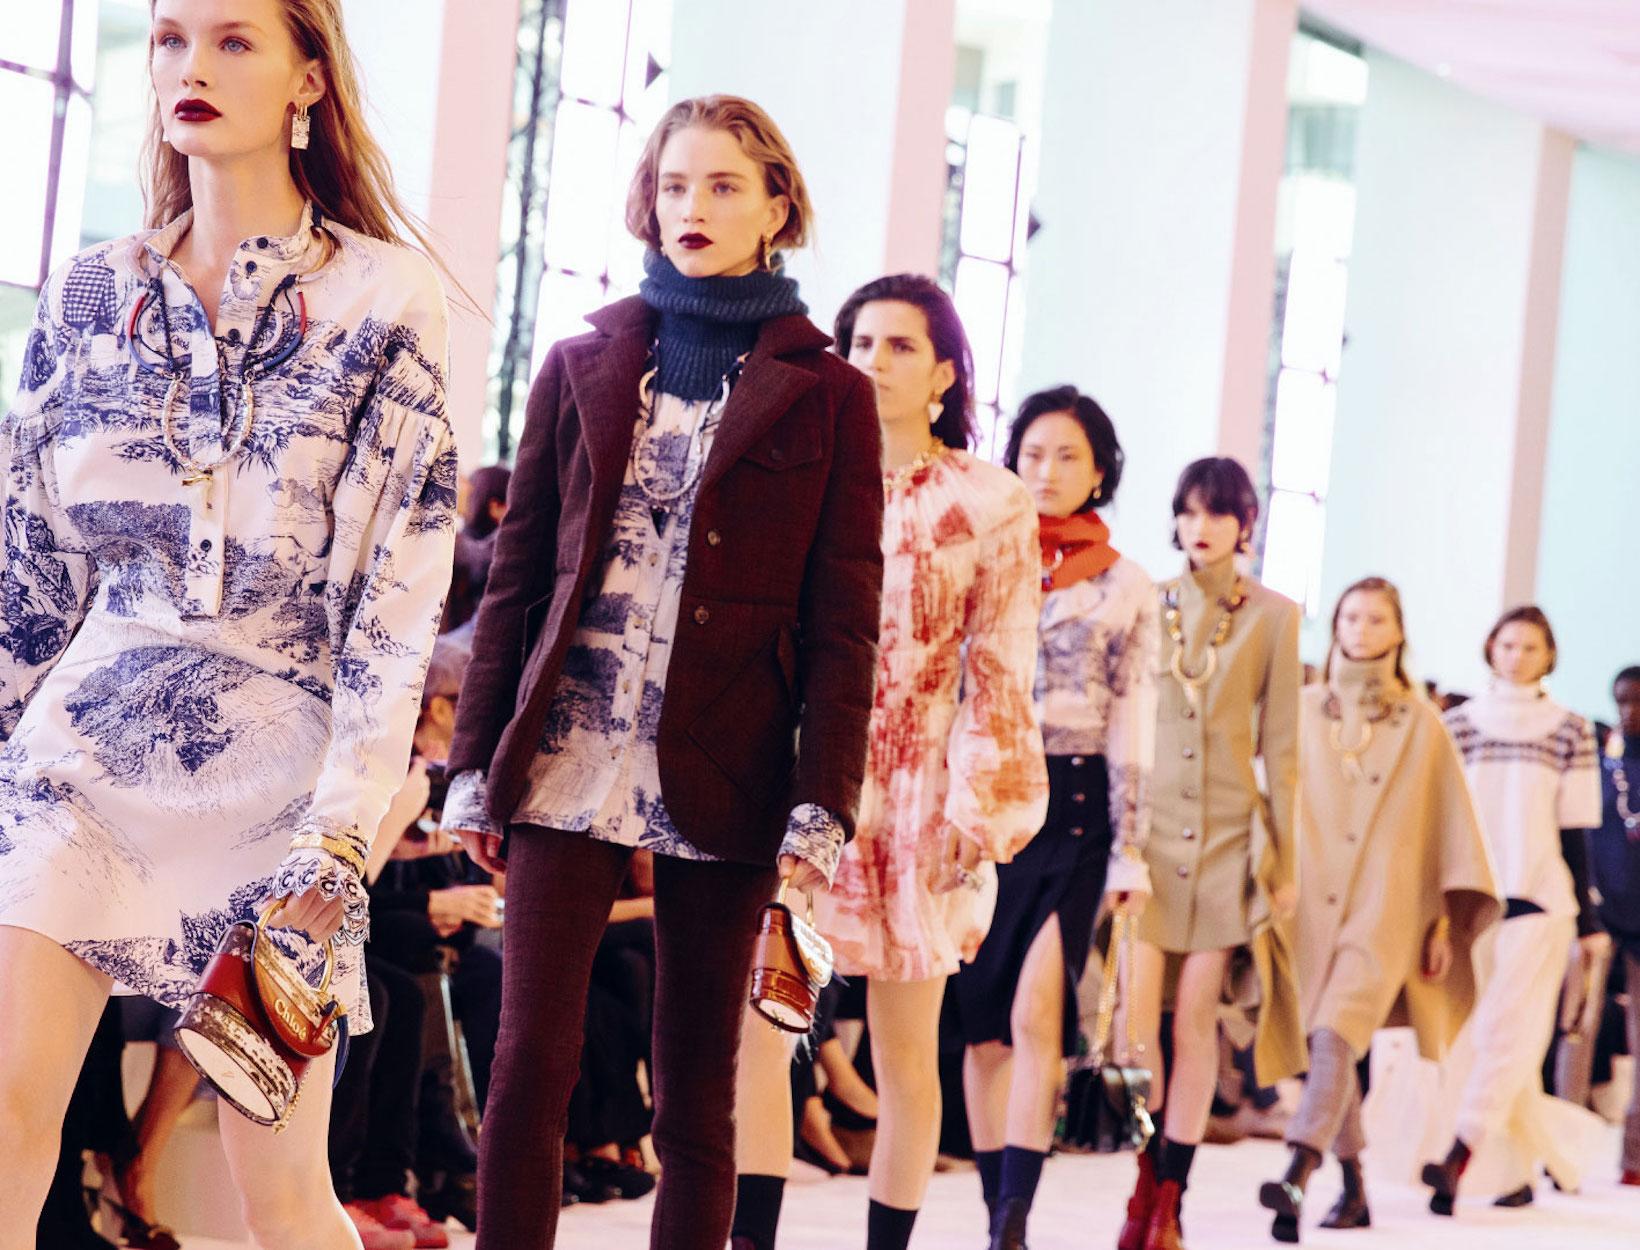 According to Ali Paris Fashion Week